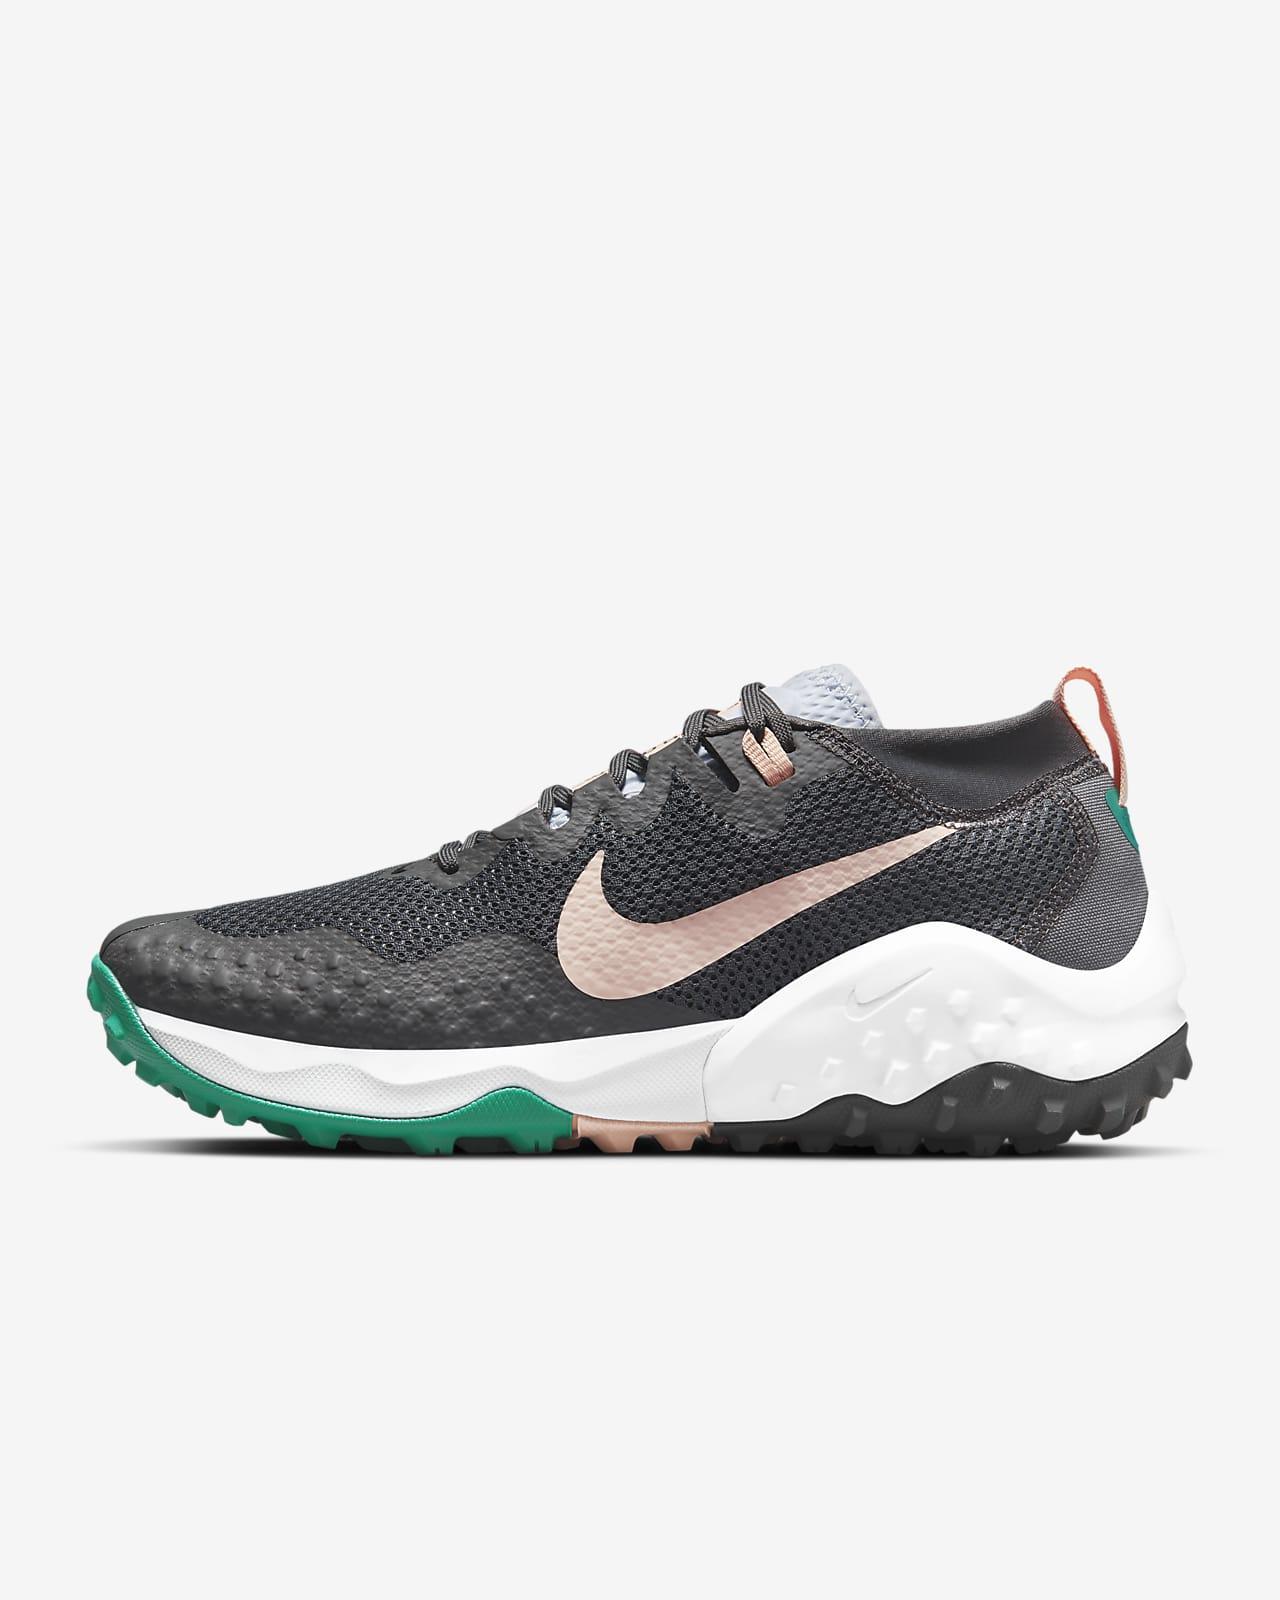 Nike Wildhorse 7 Women's Trail Running Shoe